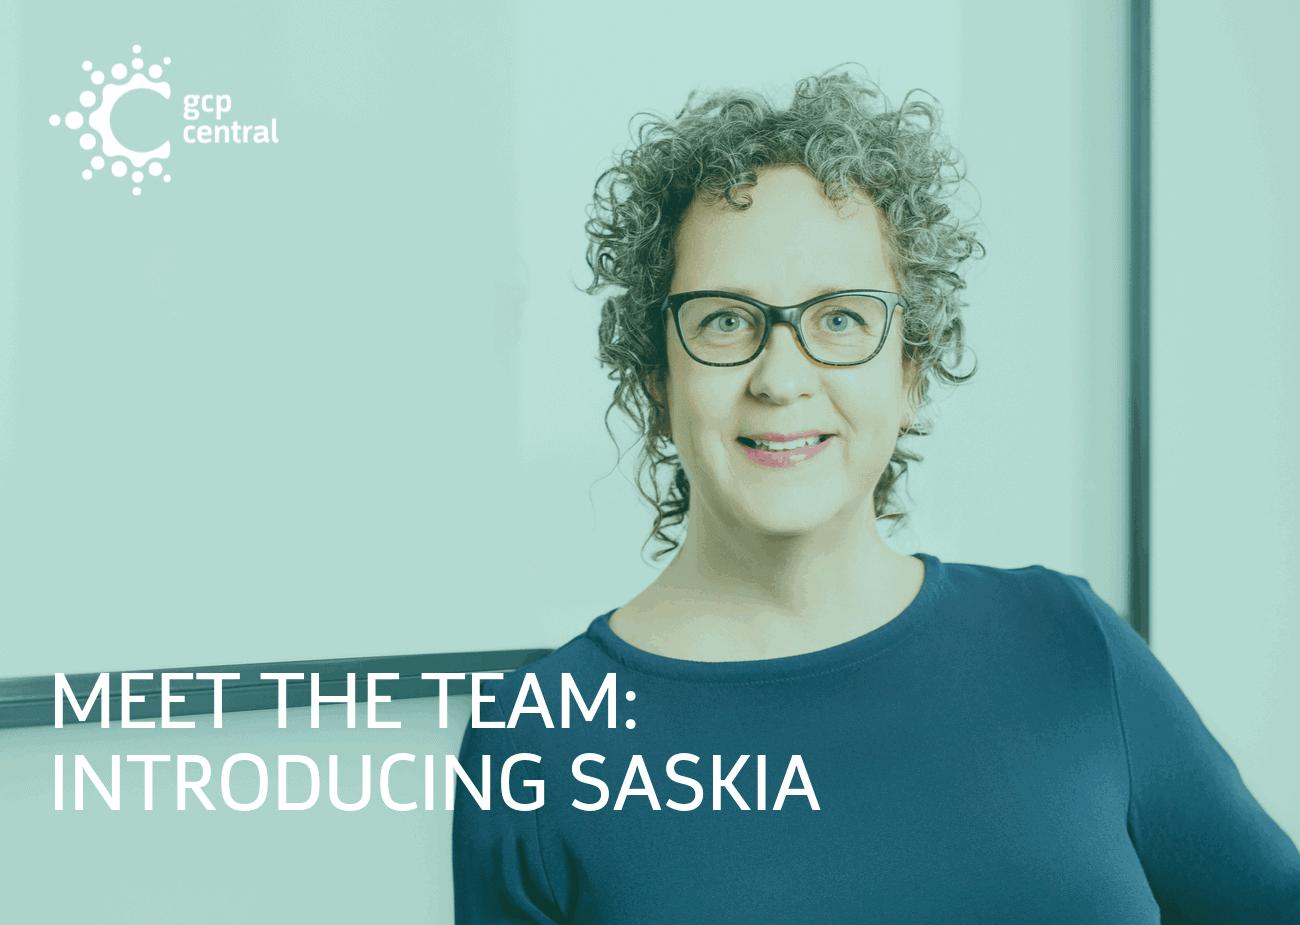 meet the team saskia gcpcentral